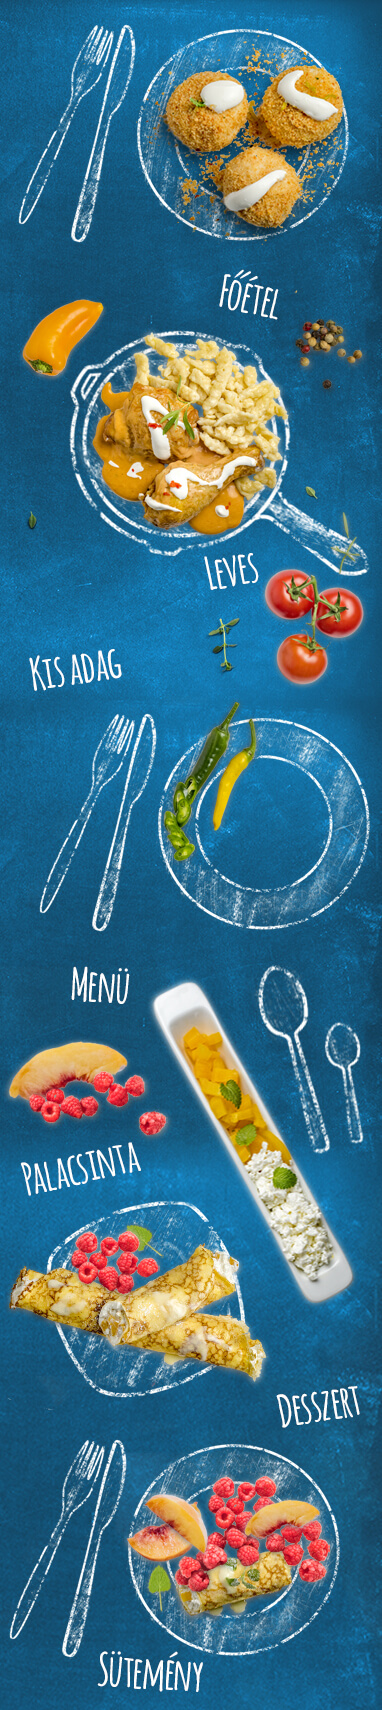 e-food: mivel fizethet